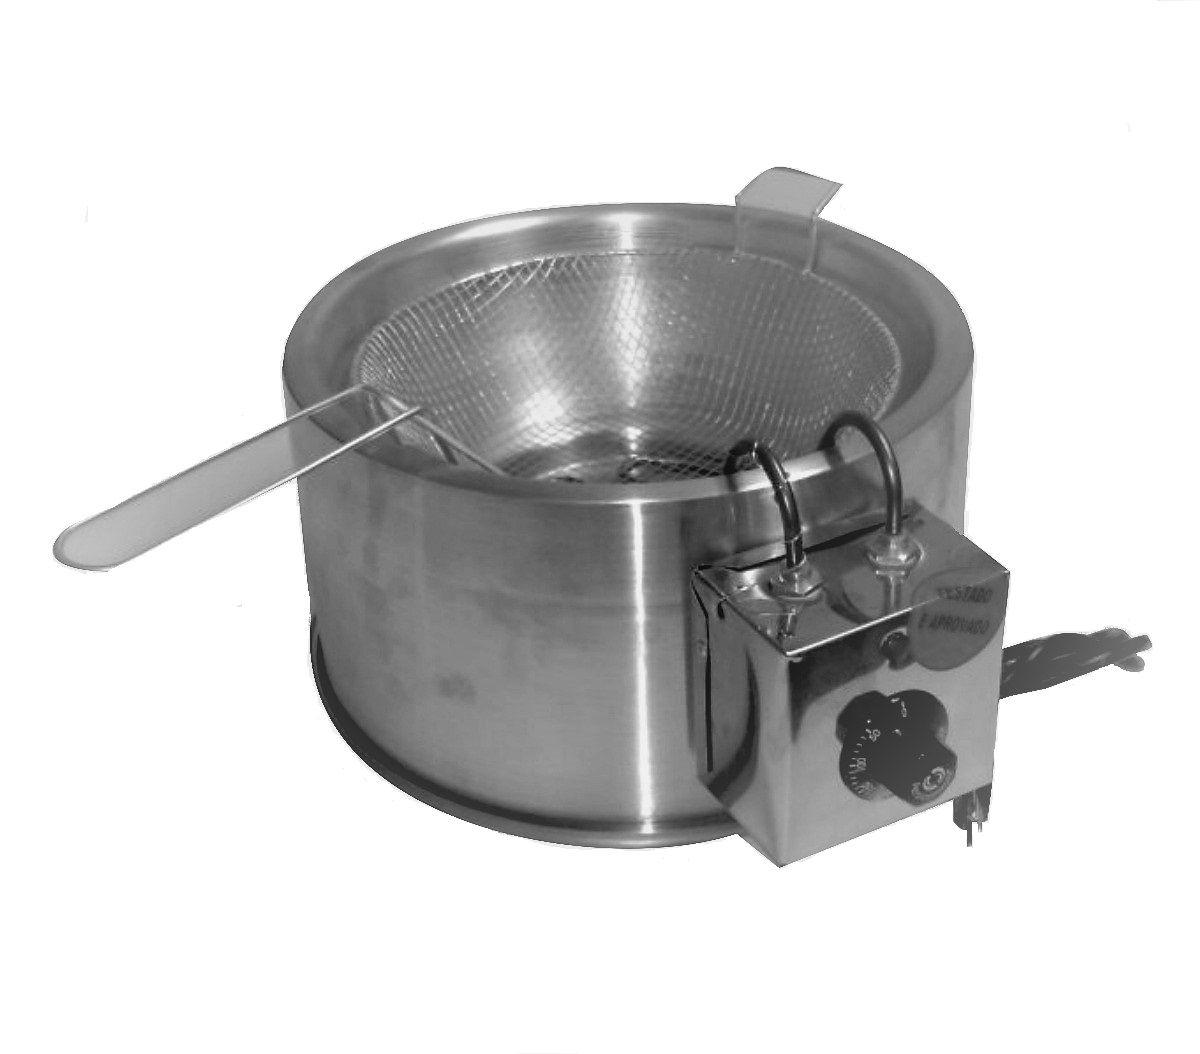 Fritadeira Elétrica Industrial  De Alumínio  5 litros 110v